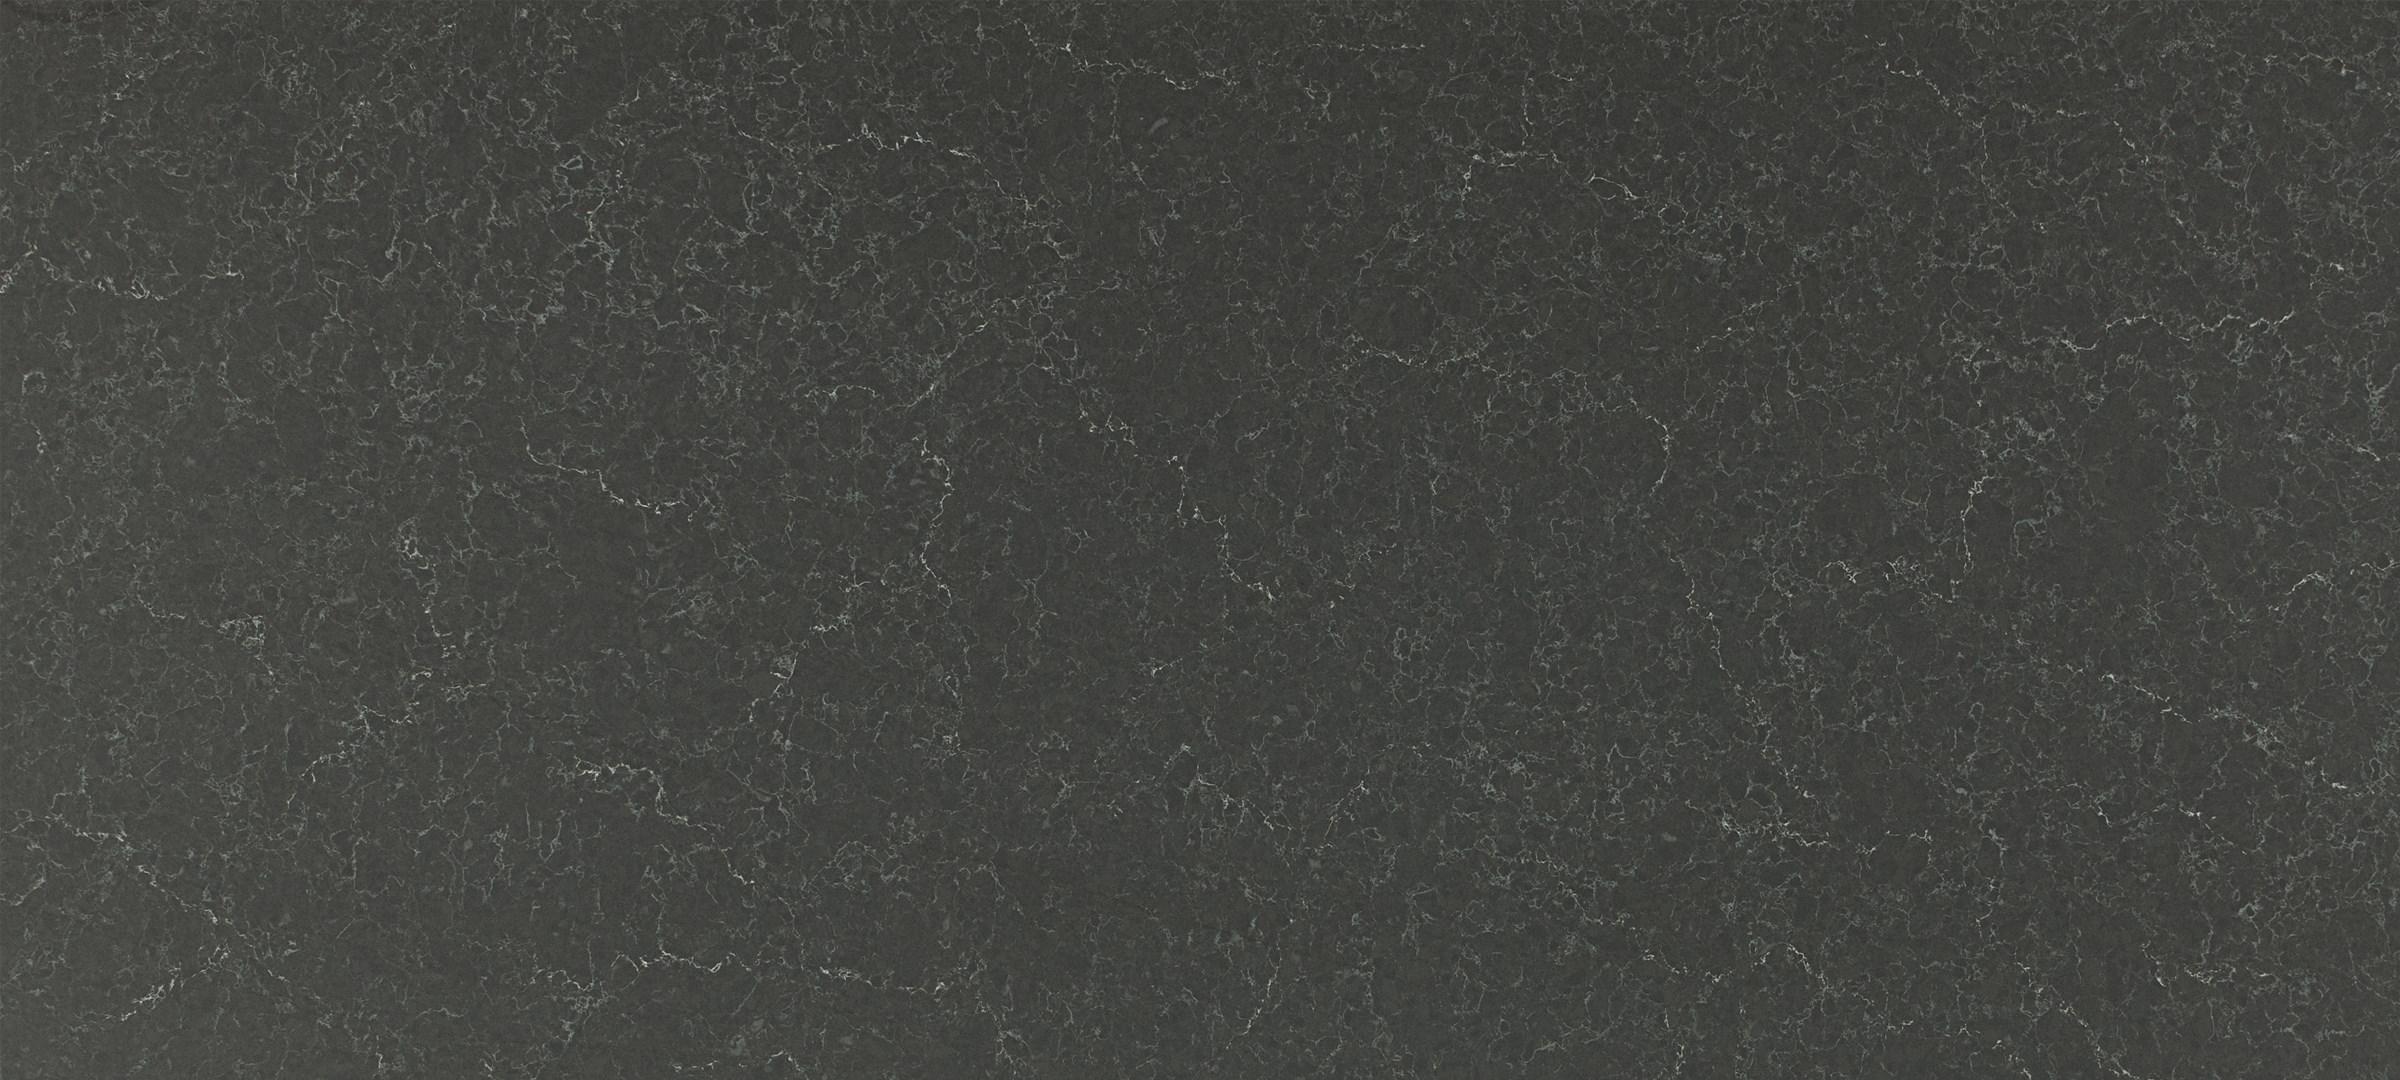 piatra gray 5003 granite countertops seattle. Black Bedroom Furniture Sets. Home Design Ideas